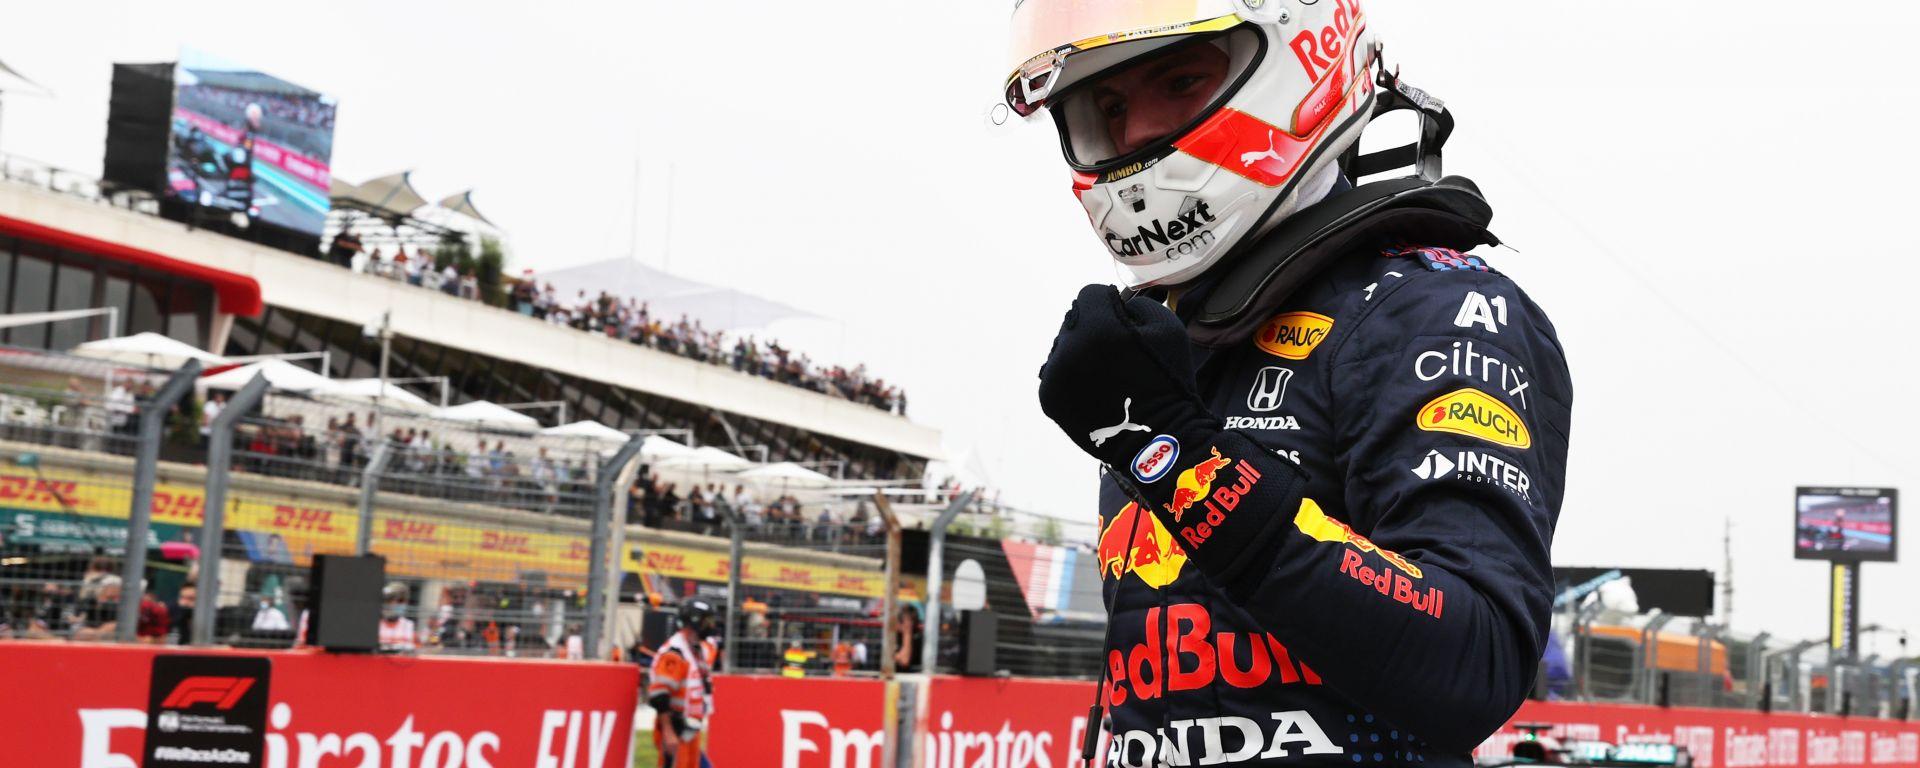 F1 GP Francia 2021, Le Castellet: Max Verstappen (Red Bull Racing) esulta per la pole position